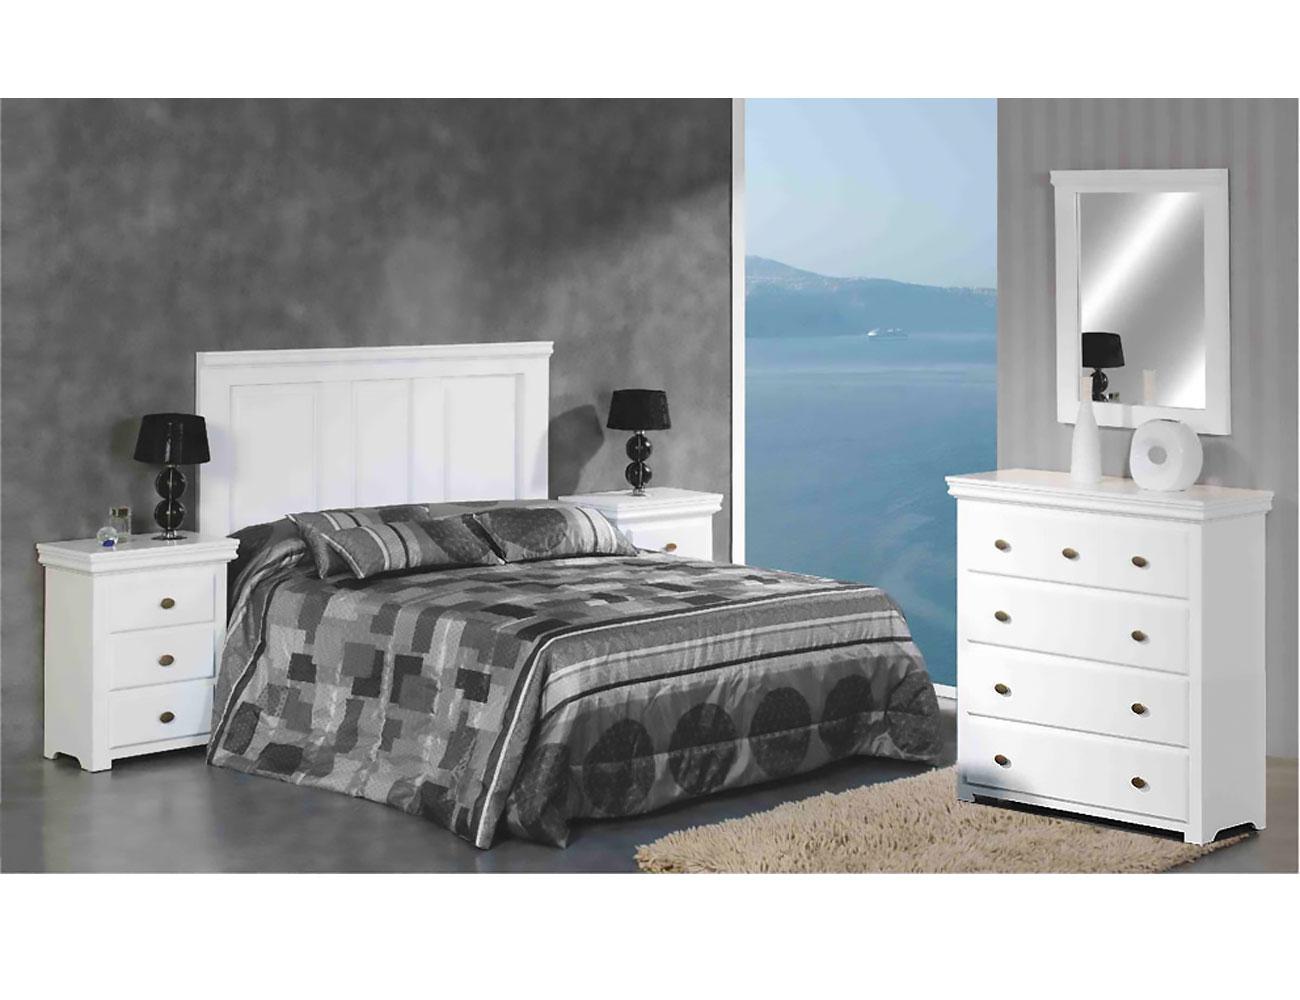 Dormitorio matrimonio comoda 5 c madera dm lacado blanco6